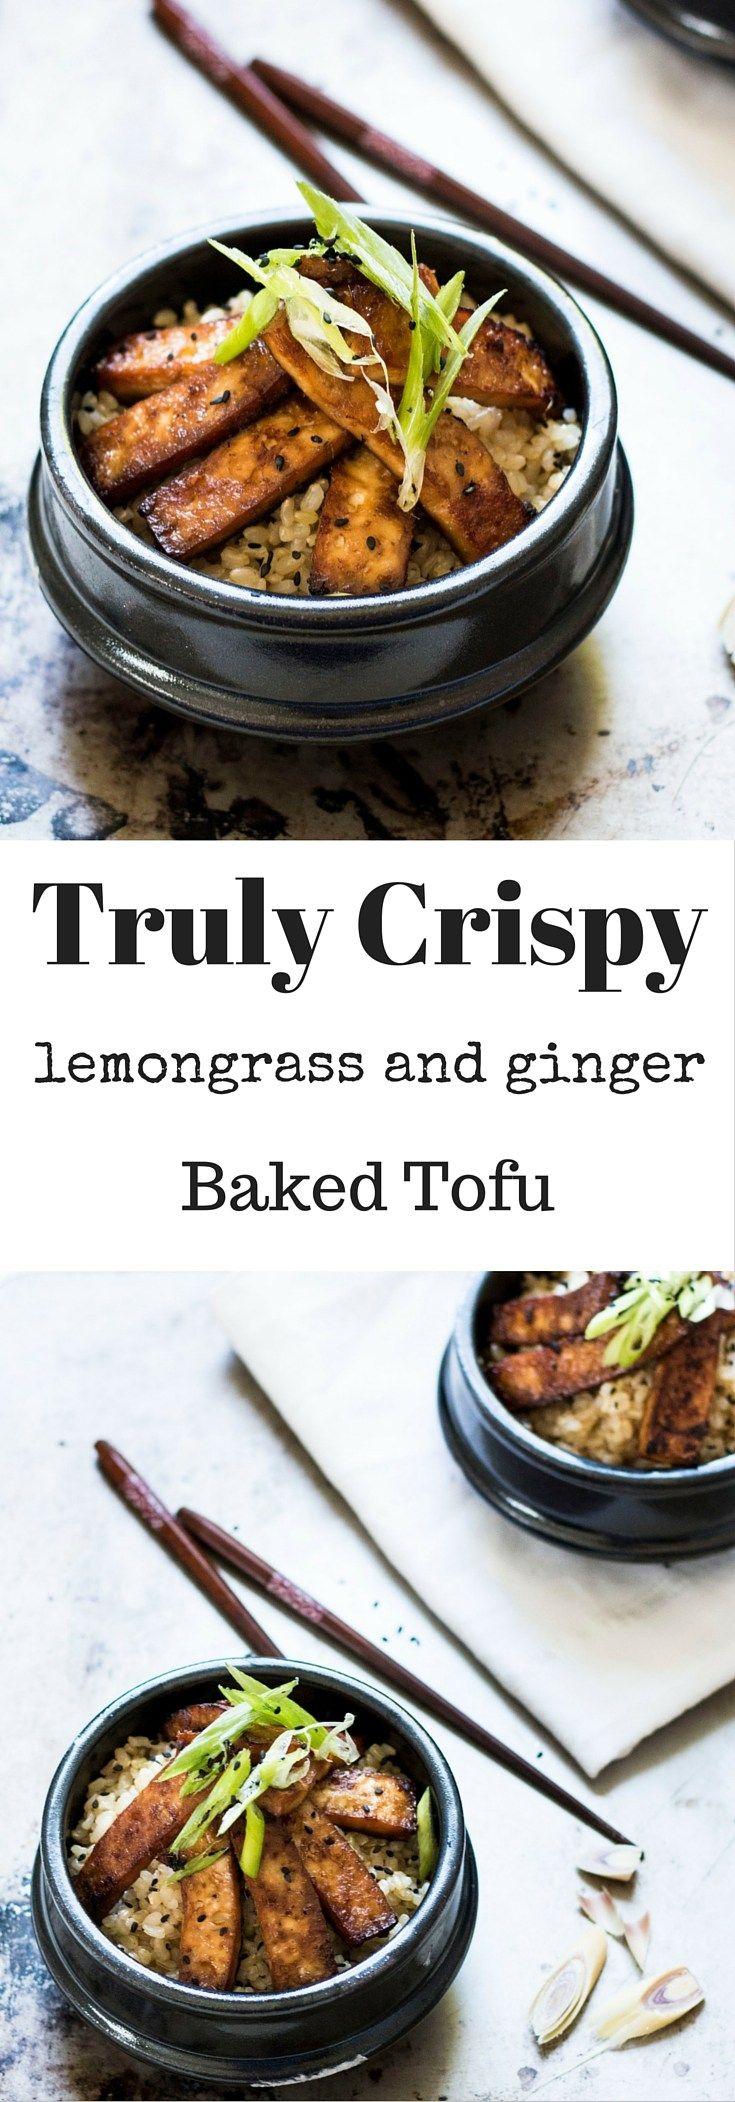 ... images about F»Tofu on Pinterest   Tofu, Tofu Scramble and Baked Tofu